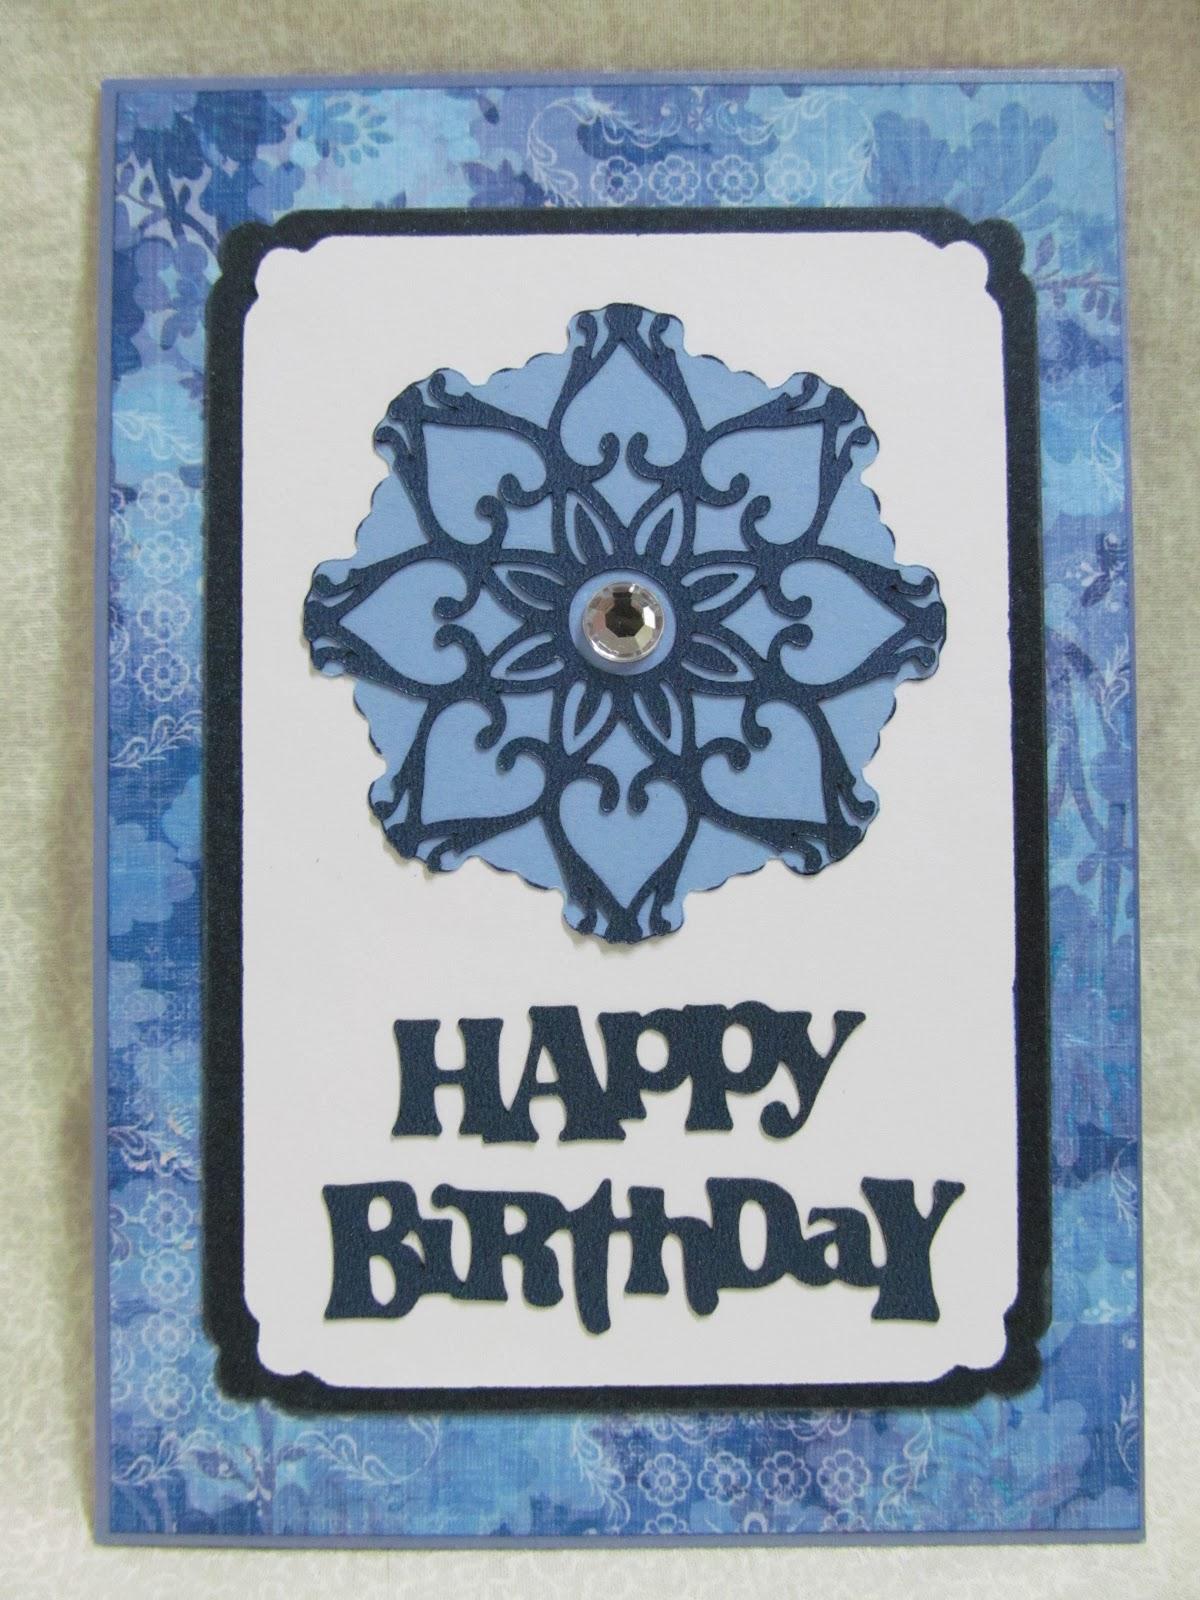 Savvy Handmade Cards: Happy Birthday Cricut Card